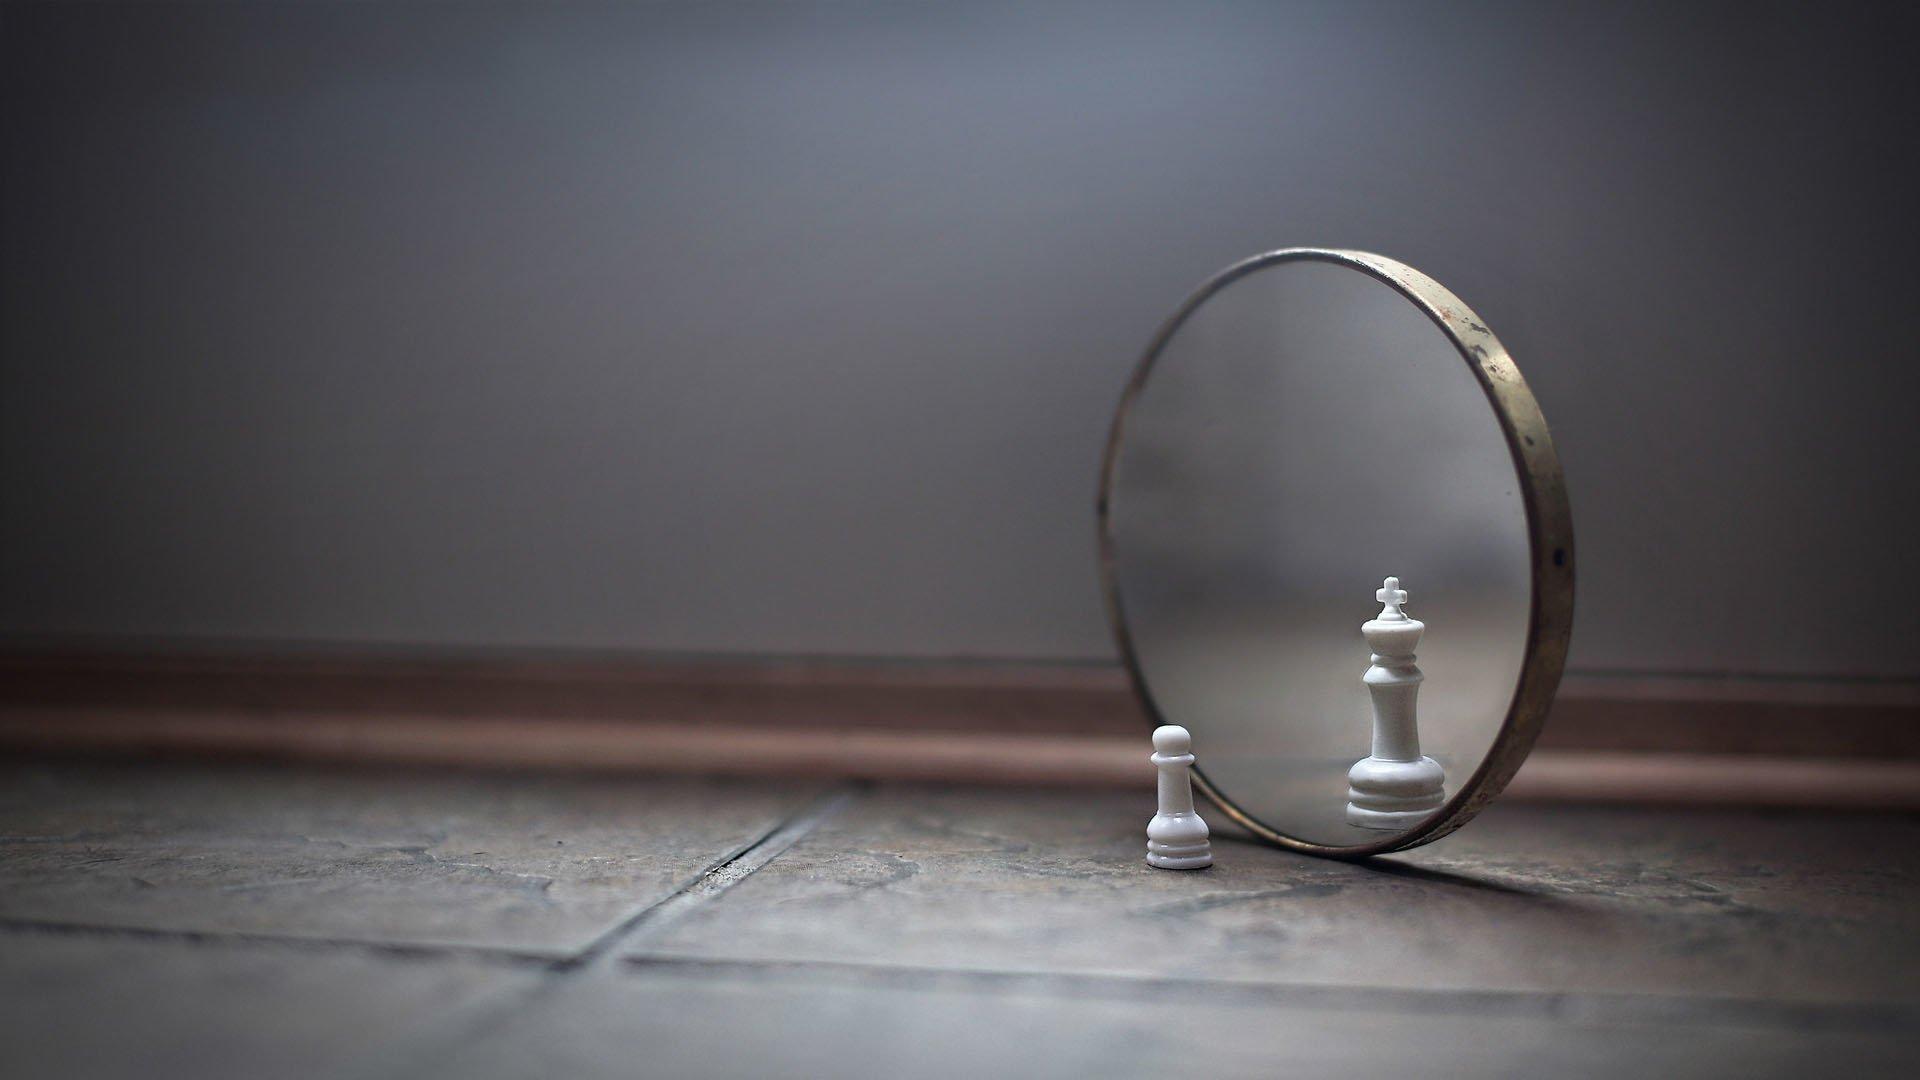 stunning hd mirror image